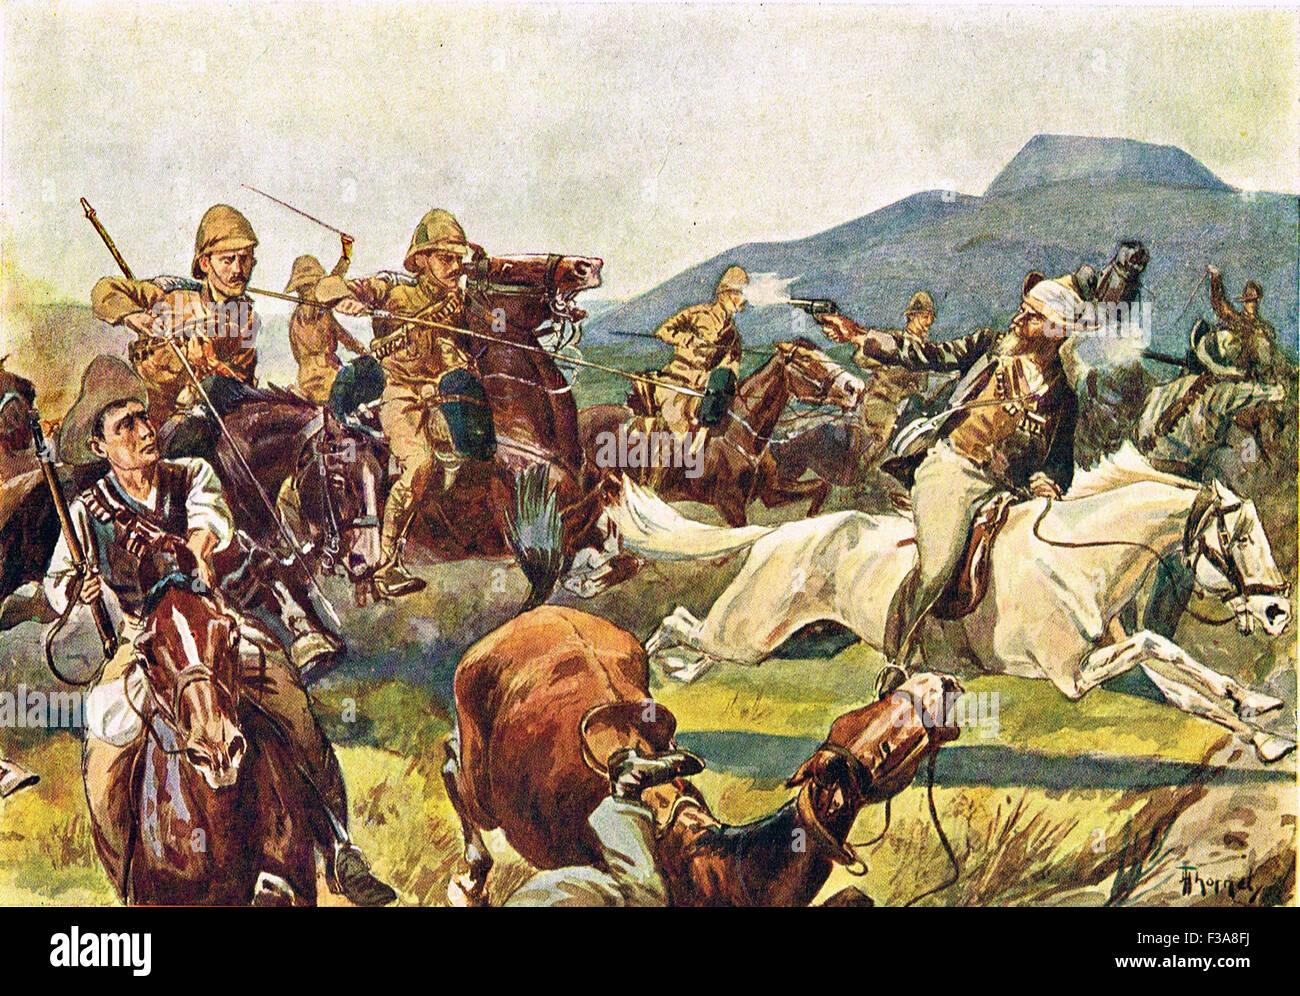 The charge at Elandslaagte Boer War 1899 - Stock Image